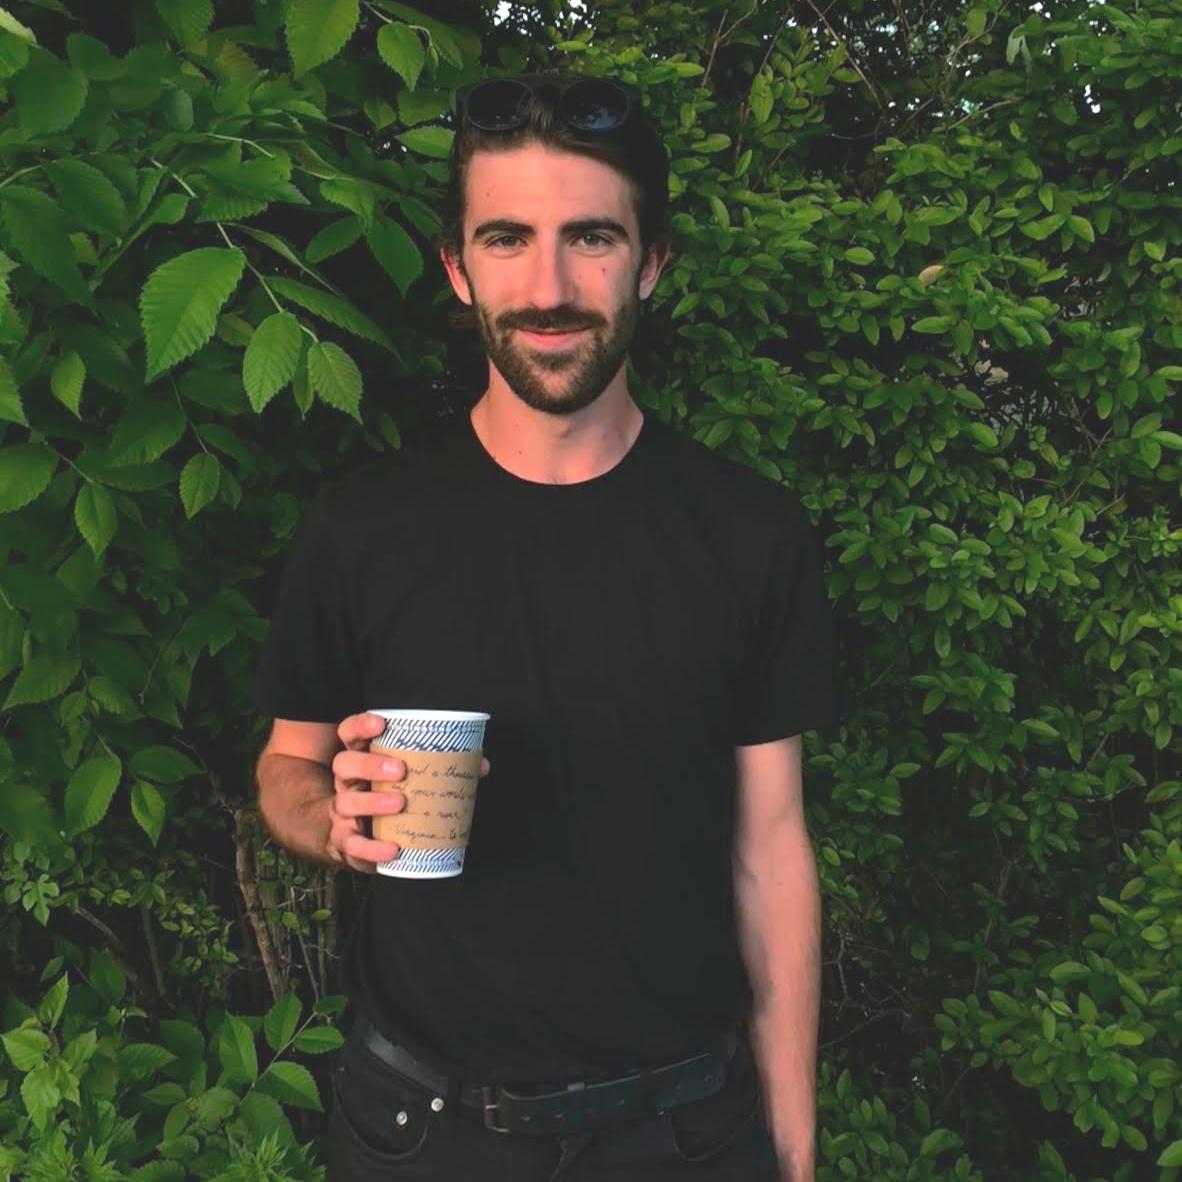 MICHAEL Bukur - CAMPAIGN FUNDRAISING MANAGERmichael.bukur@nyu.edu